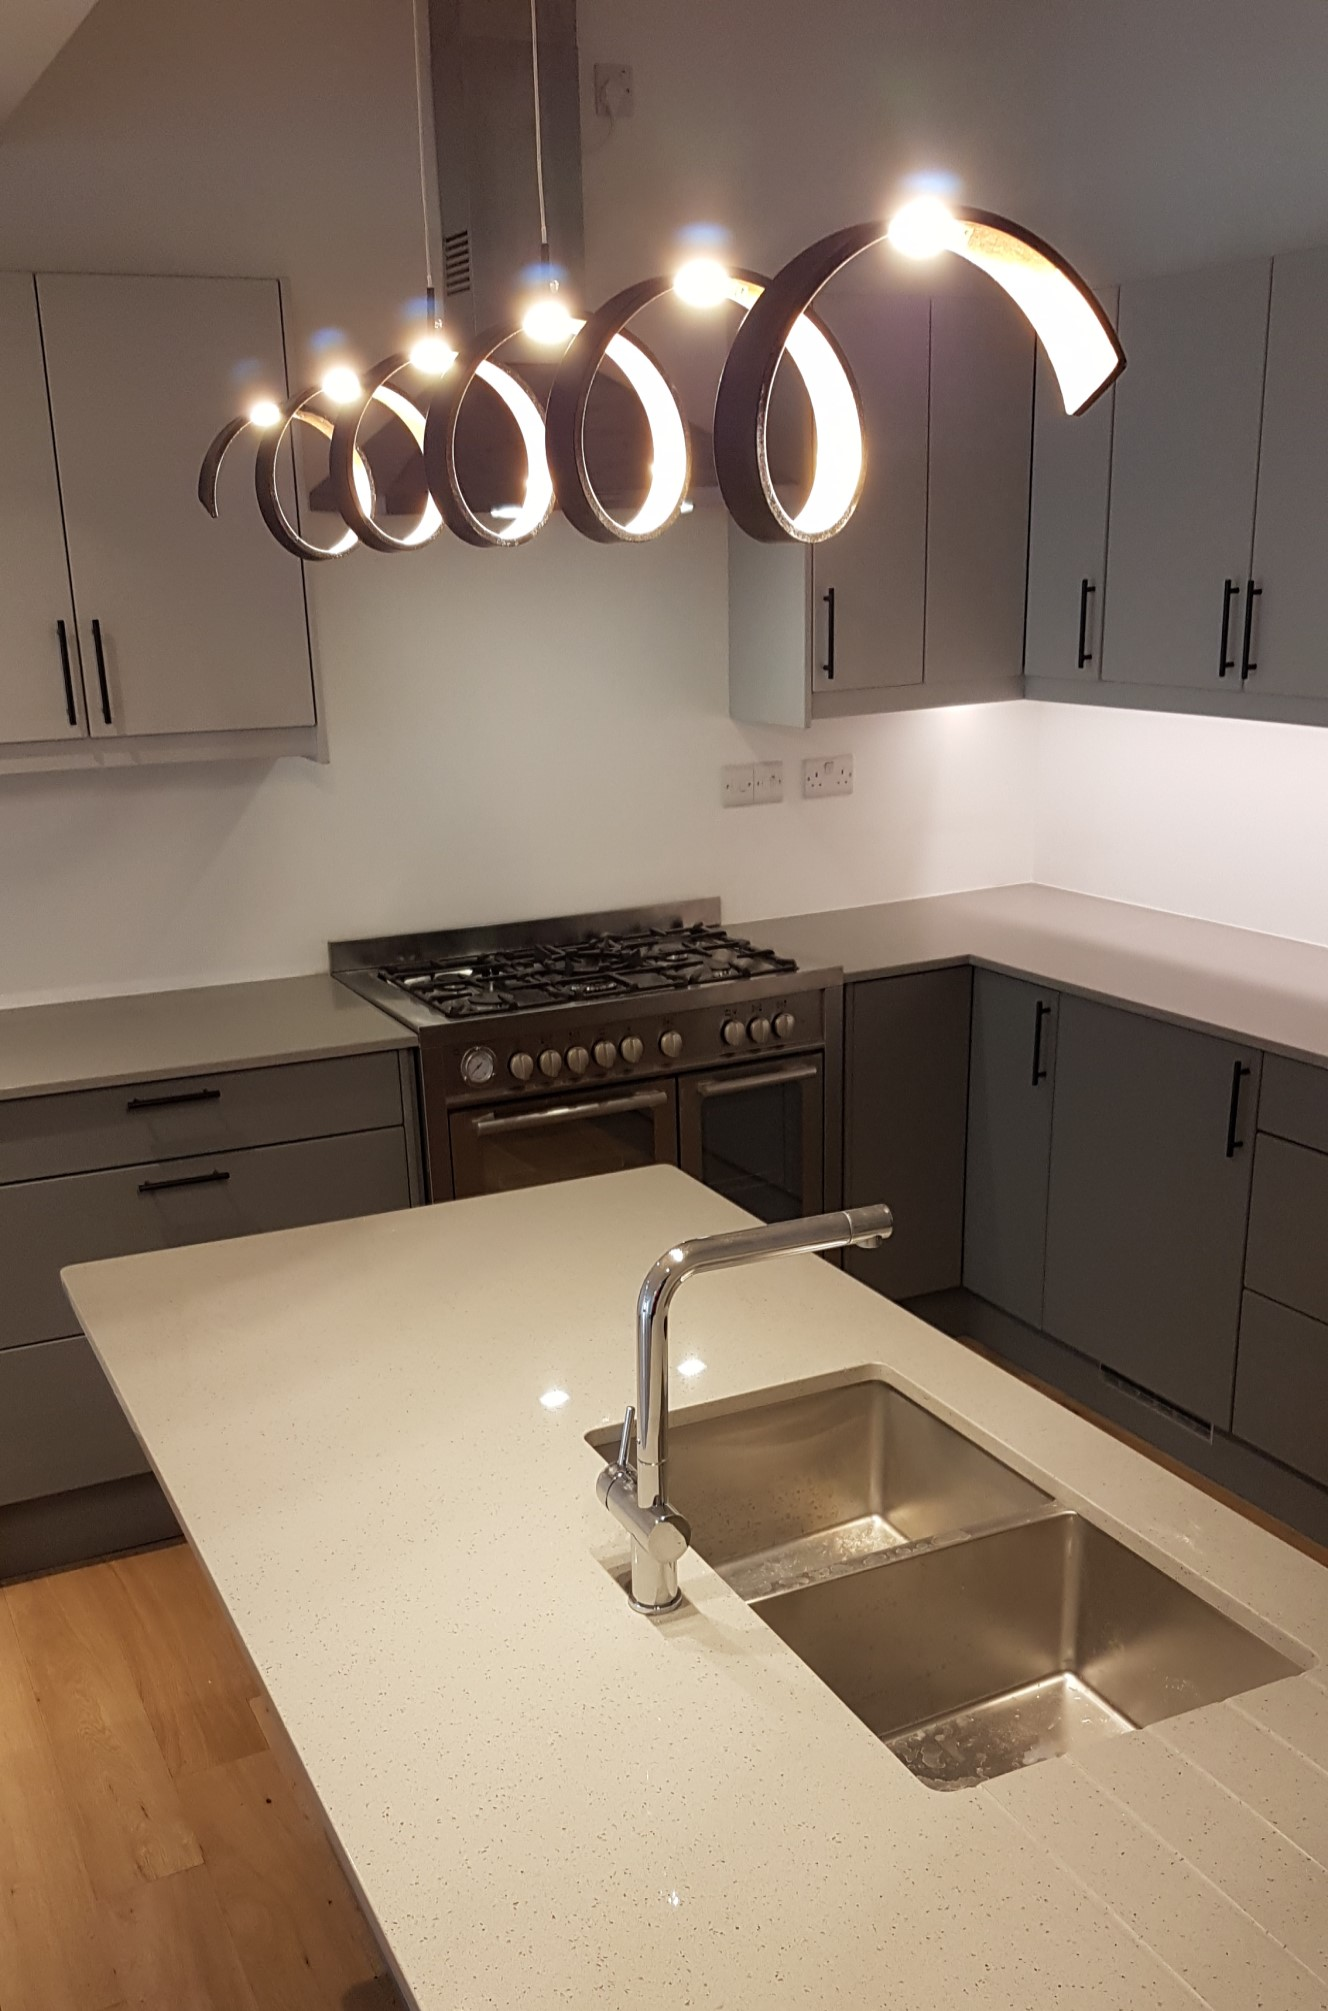 rjv-home-design-refurbishment-london-61141d37965c6